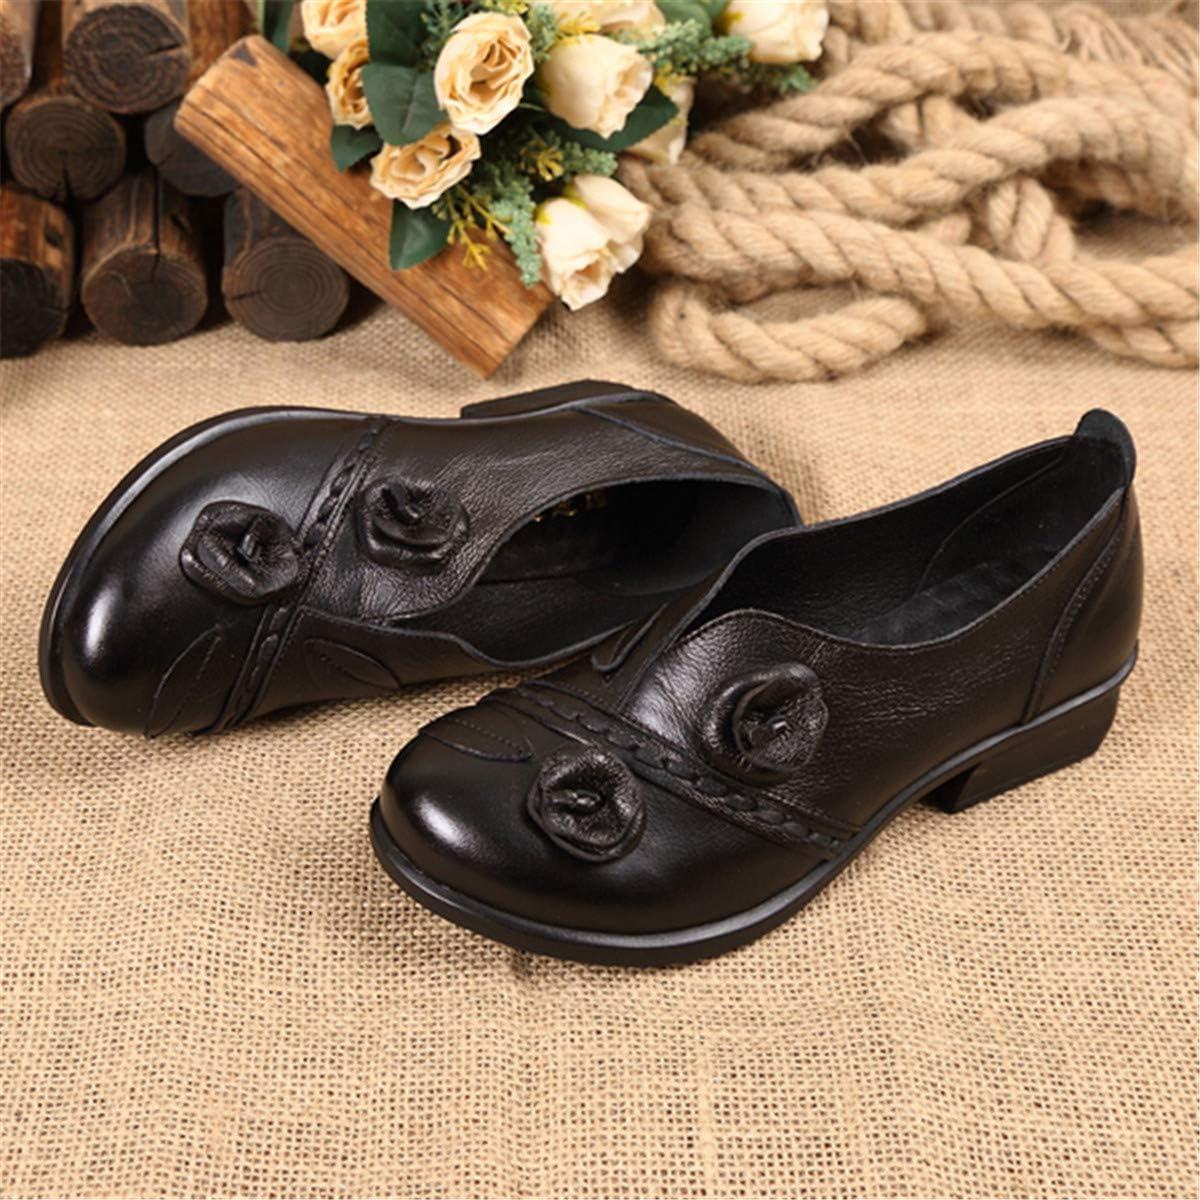 Socofy Damen Mokassins Leder Loafers Bootsschuhe Mary Janes Damenschuhe mit Blockabsatz Halbschuhe Slippers Erbsenschuhe Frauen Pumps Vintage Party